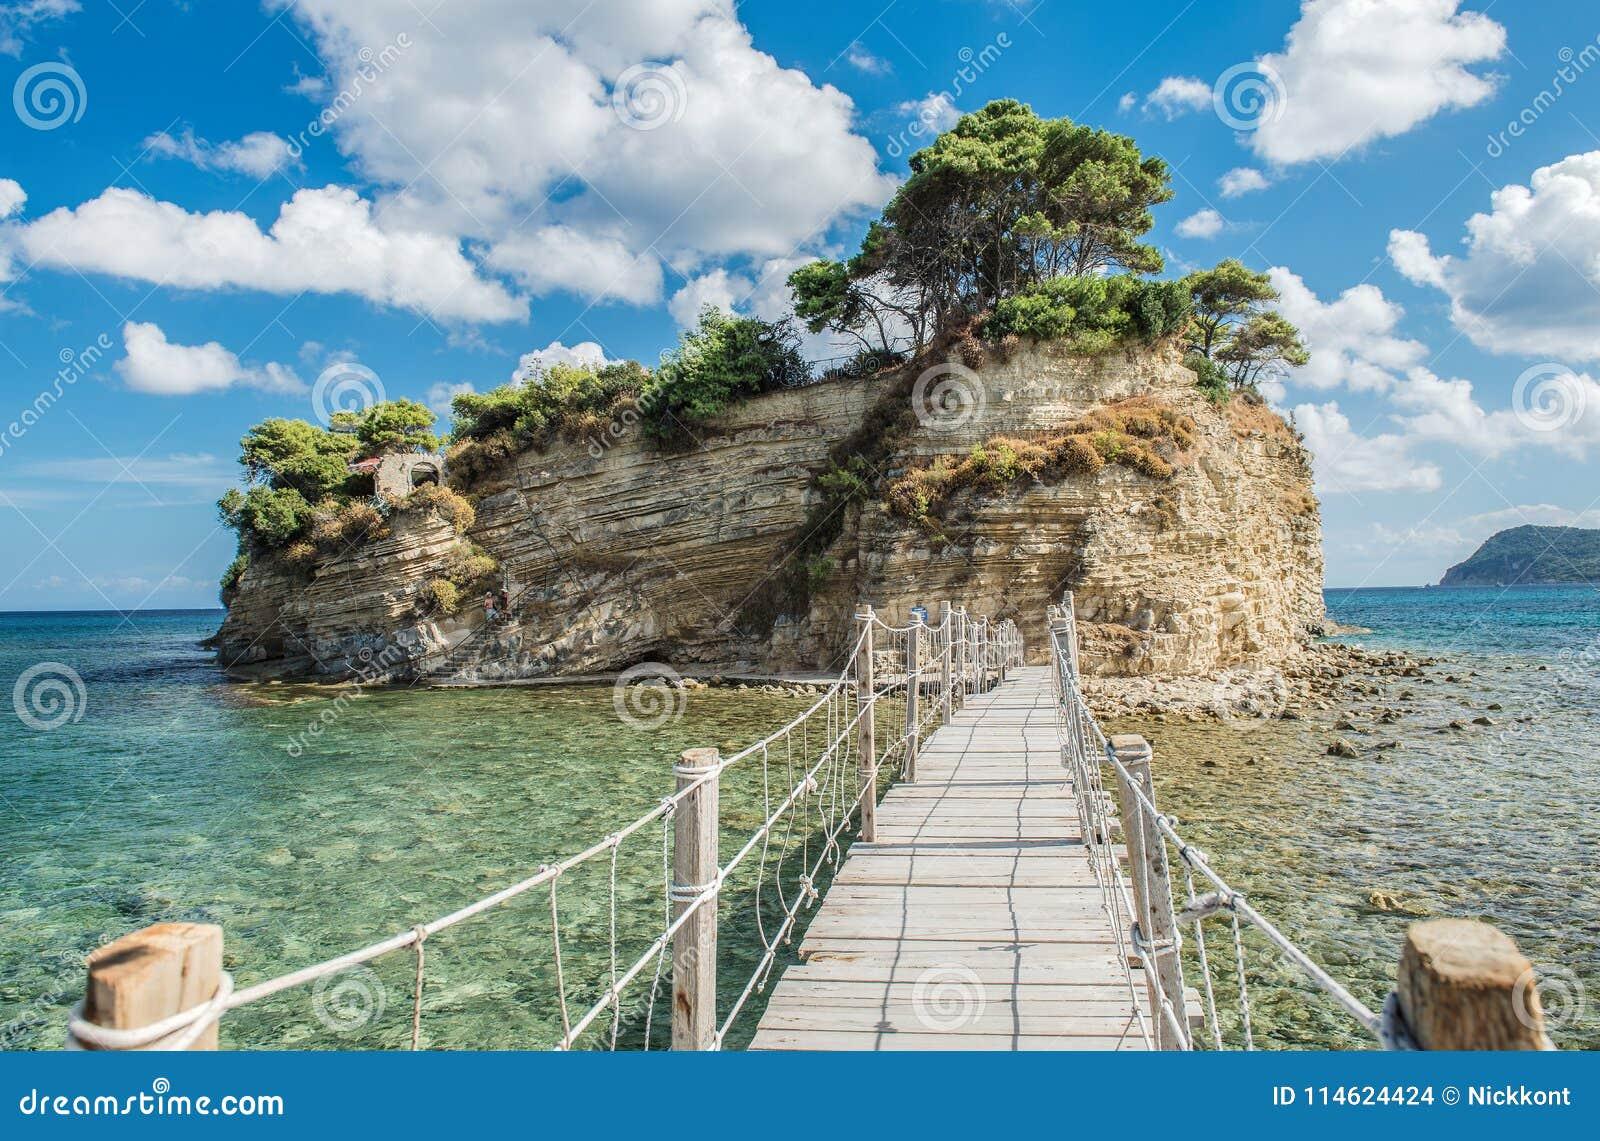 Stunning cameo island in Zakynthos